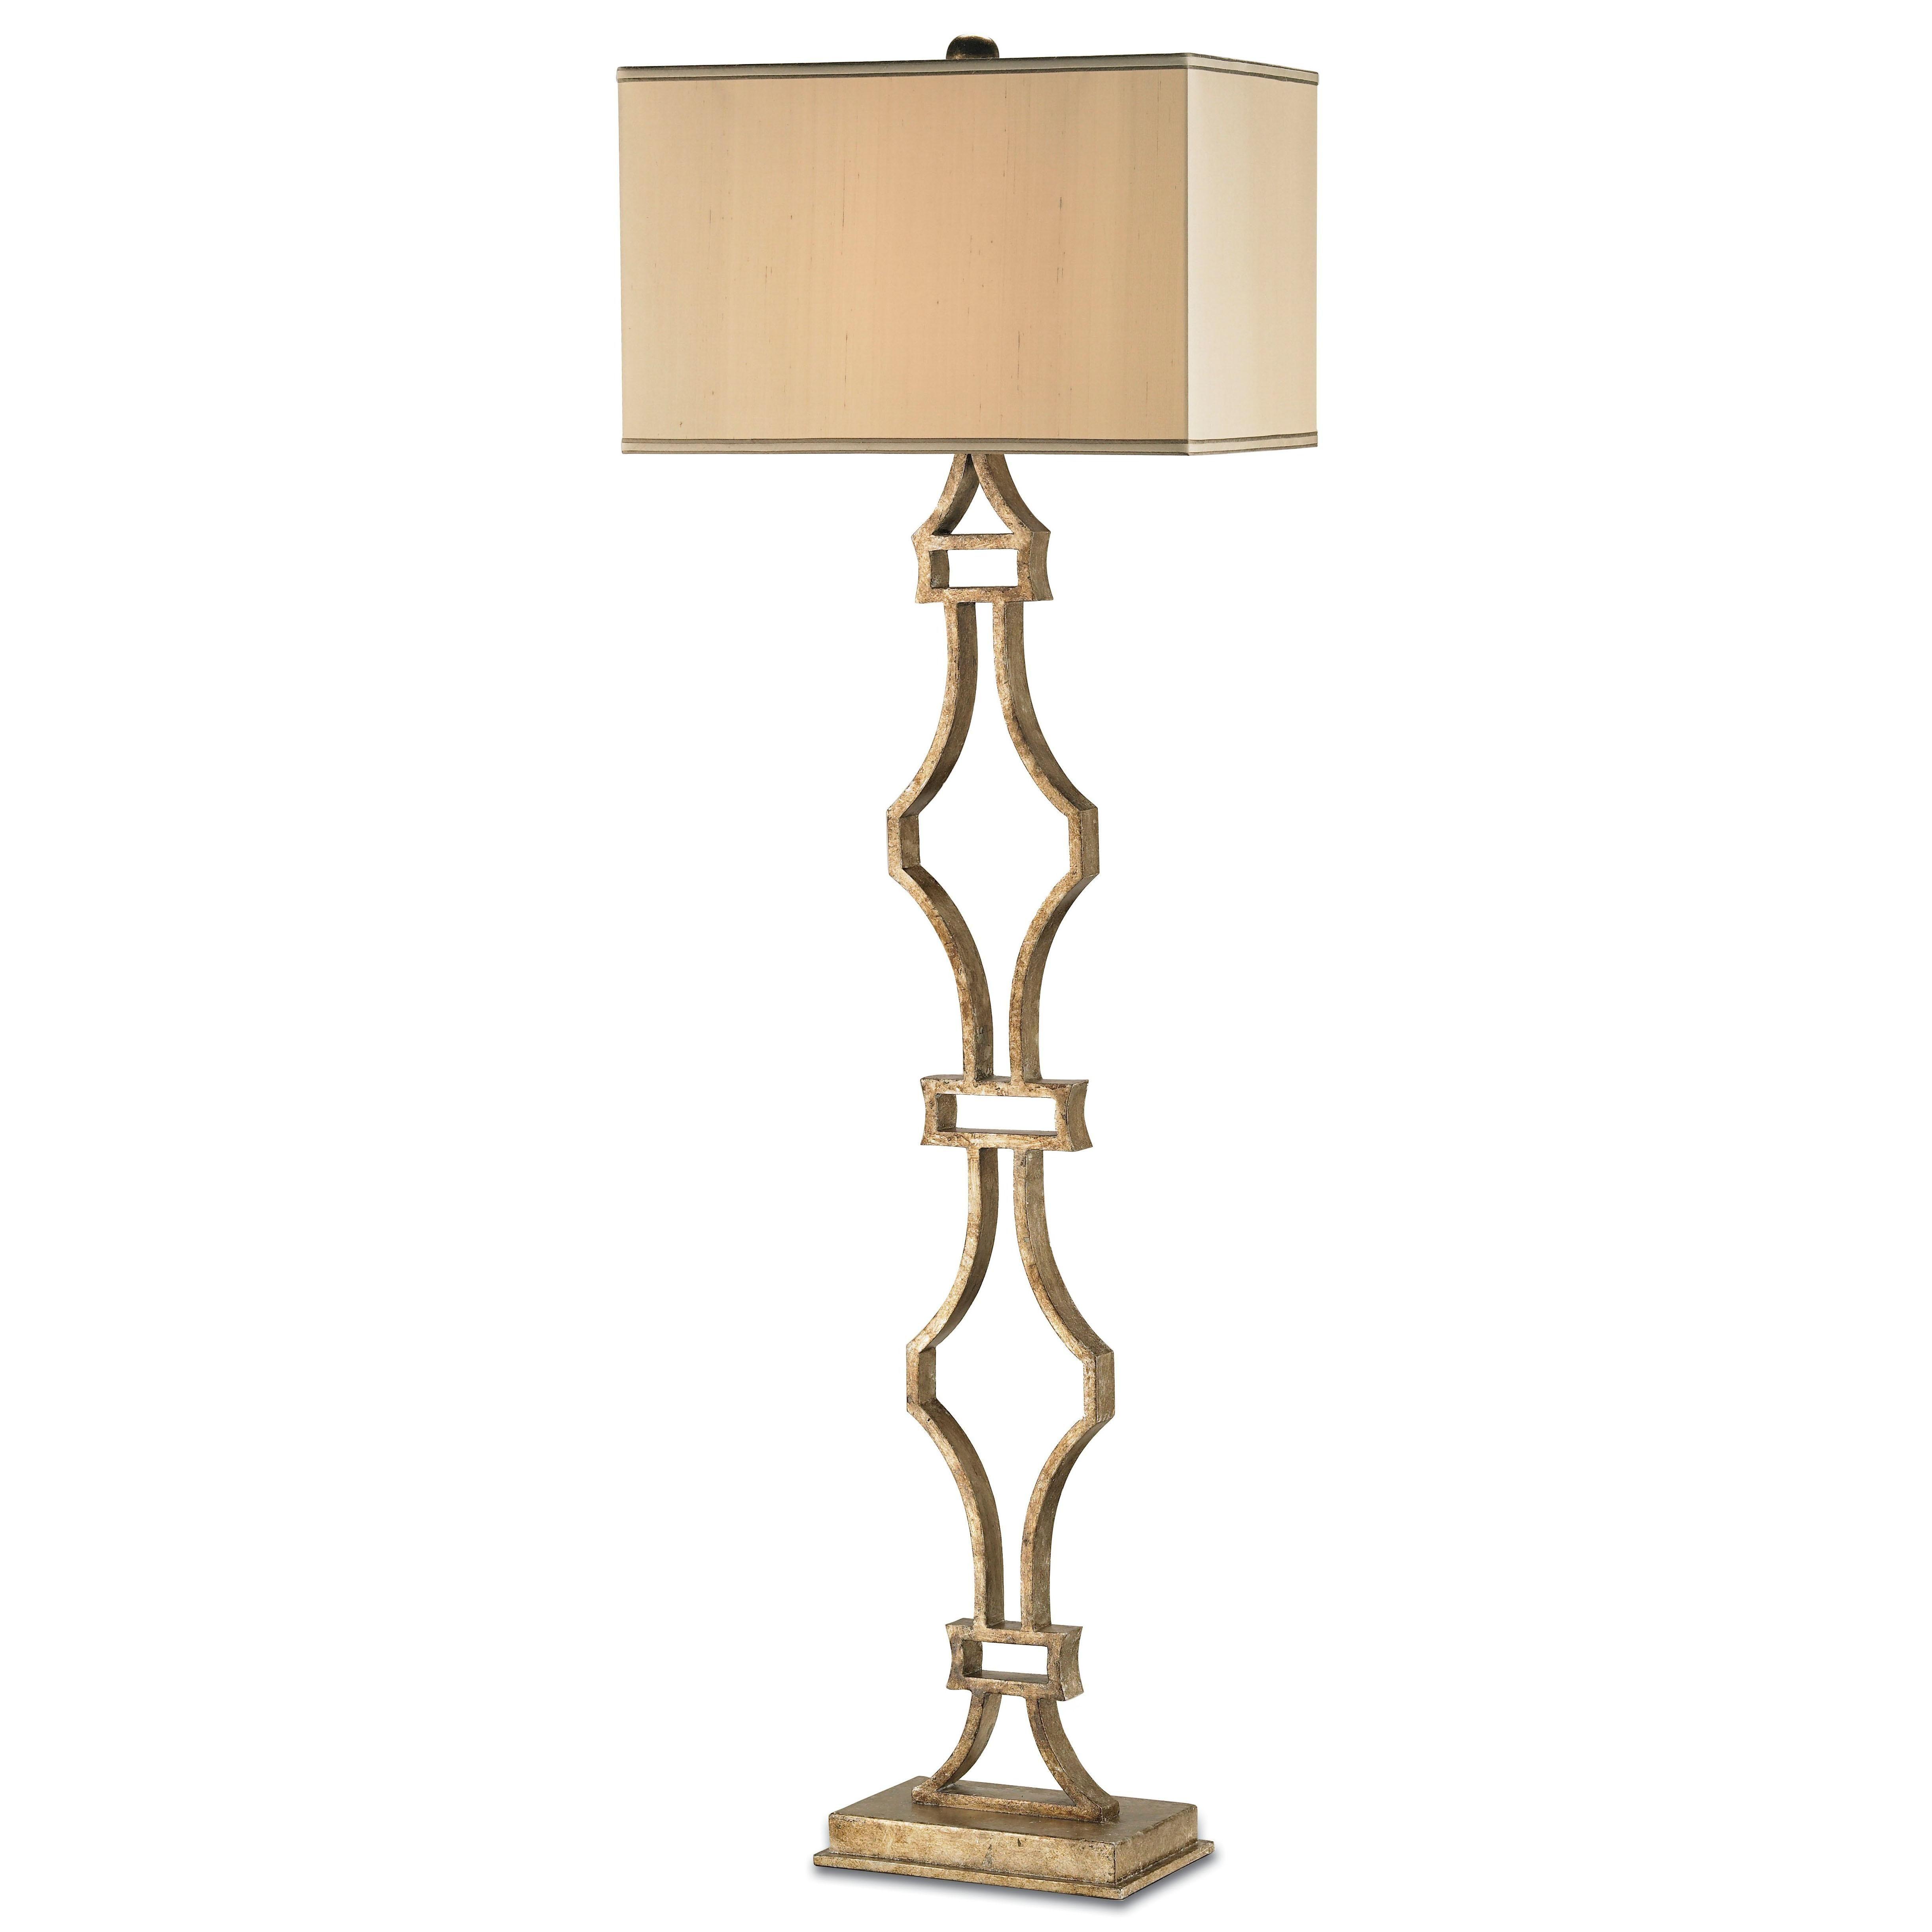 Currey Amp Co Eternity Floor Lamp Currey Co 8028 Candelabra Inc Elegant Floor Lamps Floor Lamp Transitional Floor Lamps